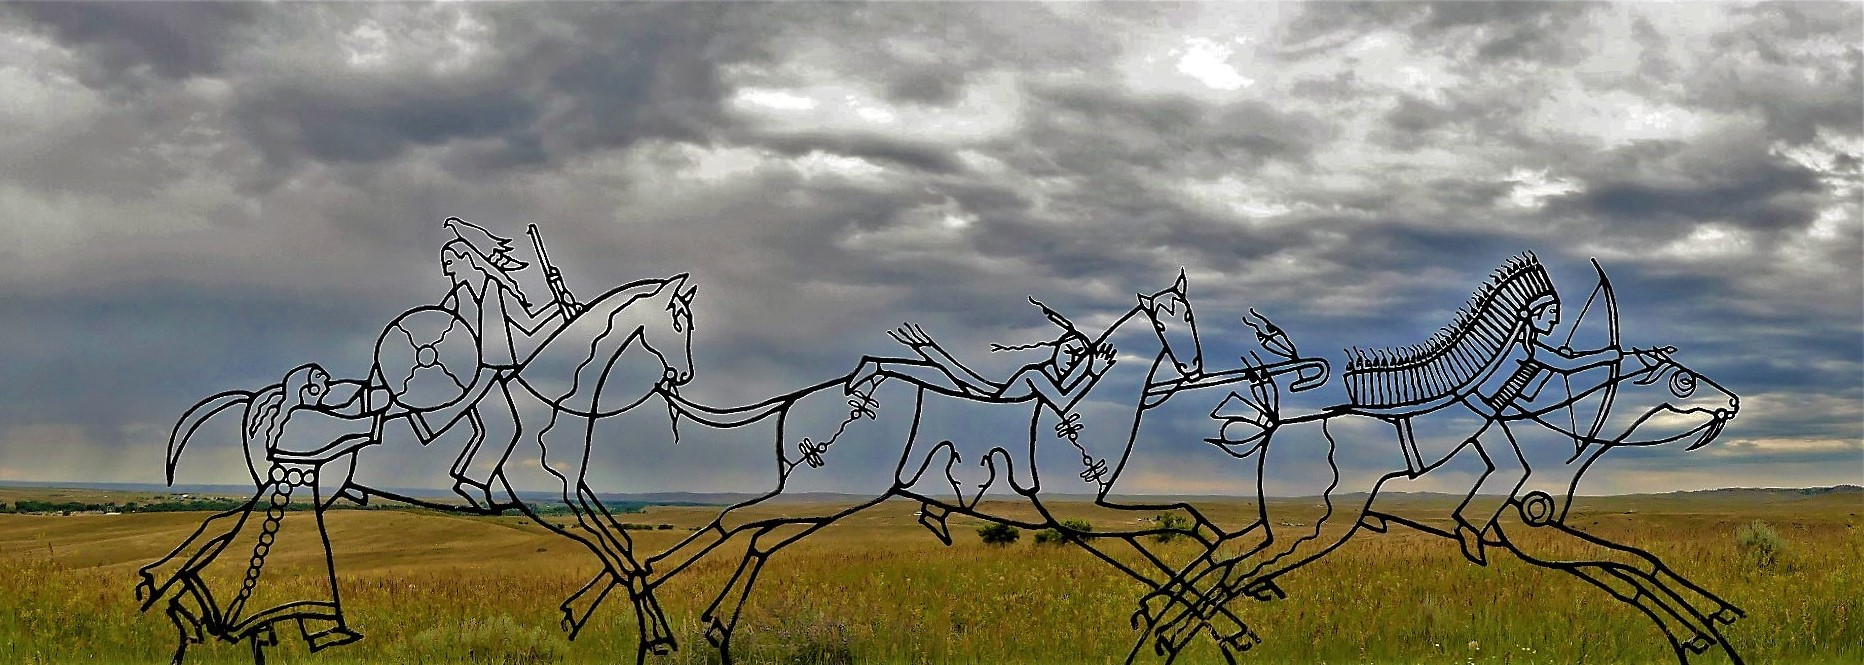 Custer Battlefield National Memorial